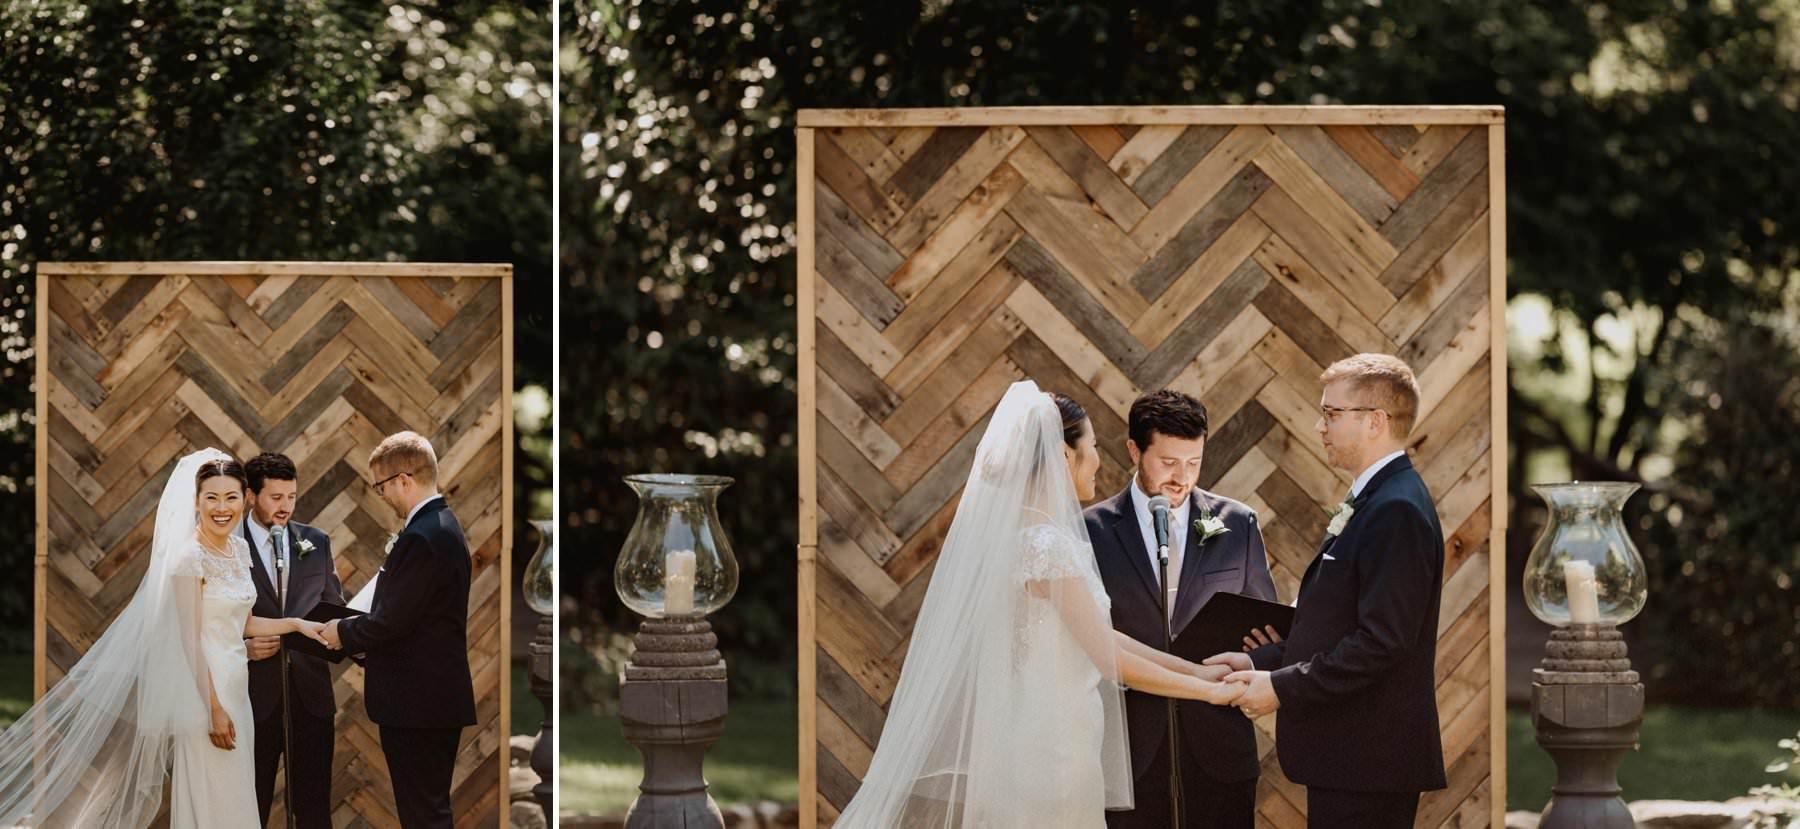 Appleford-estate-wedding-89.jpg